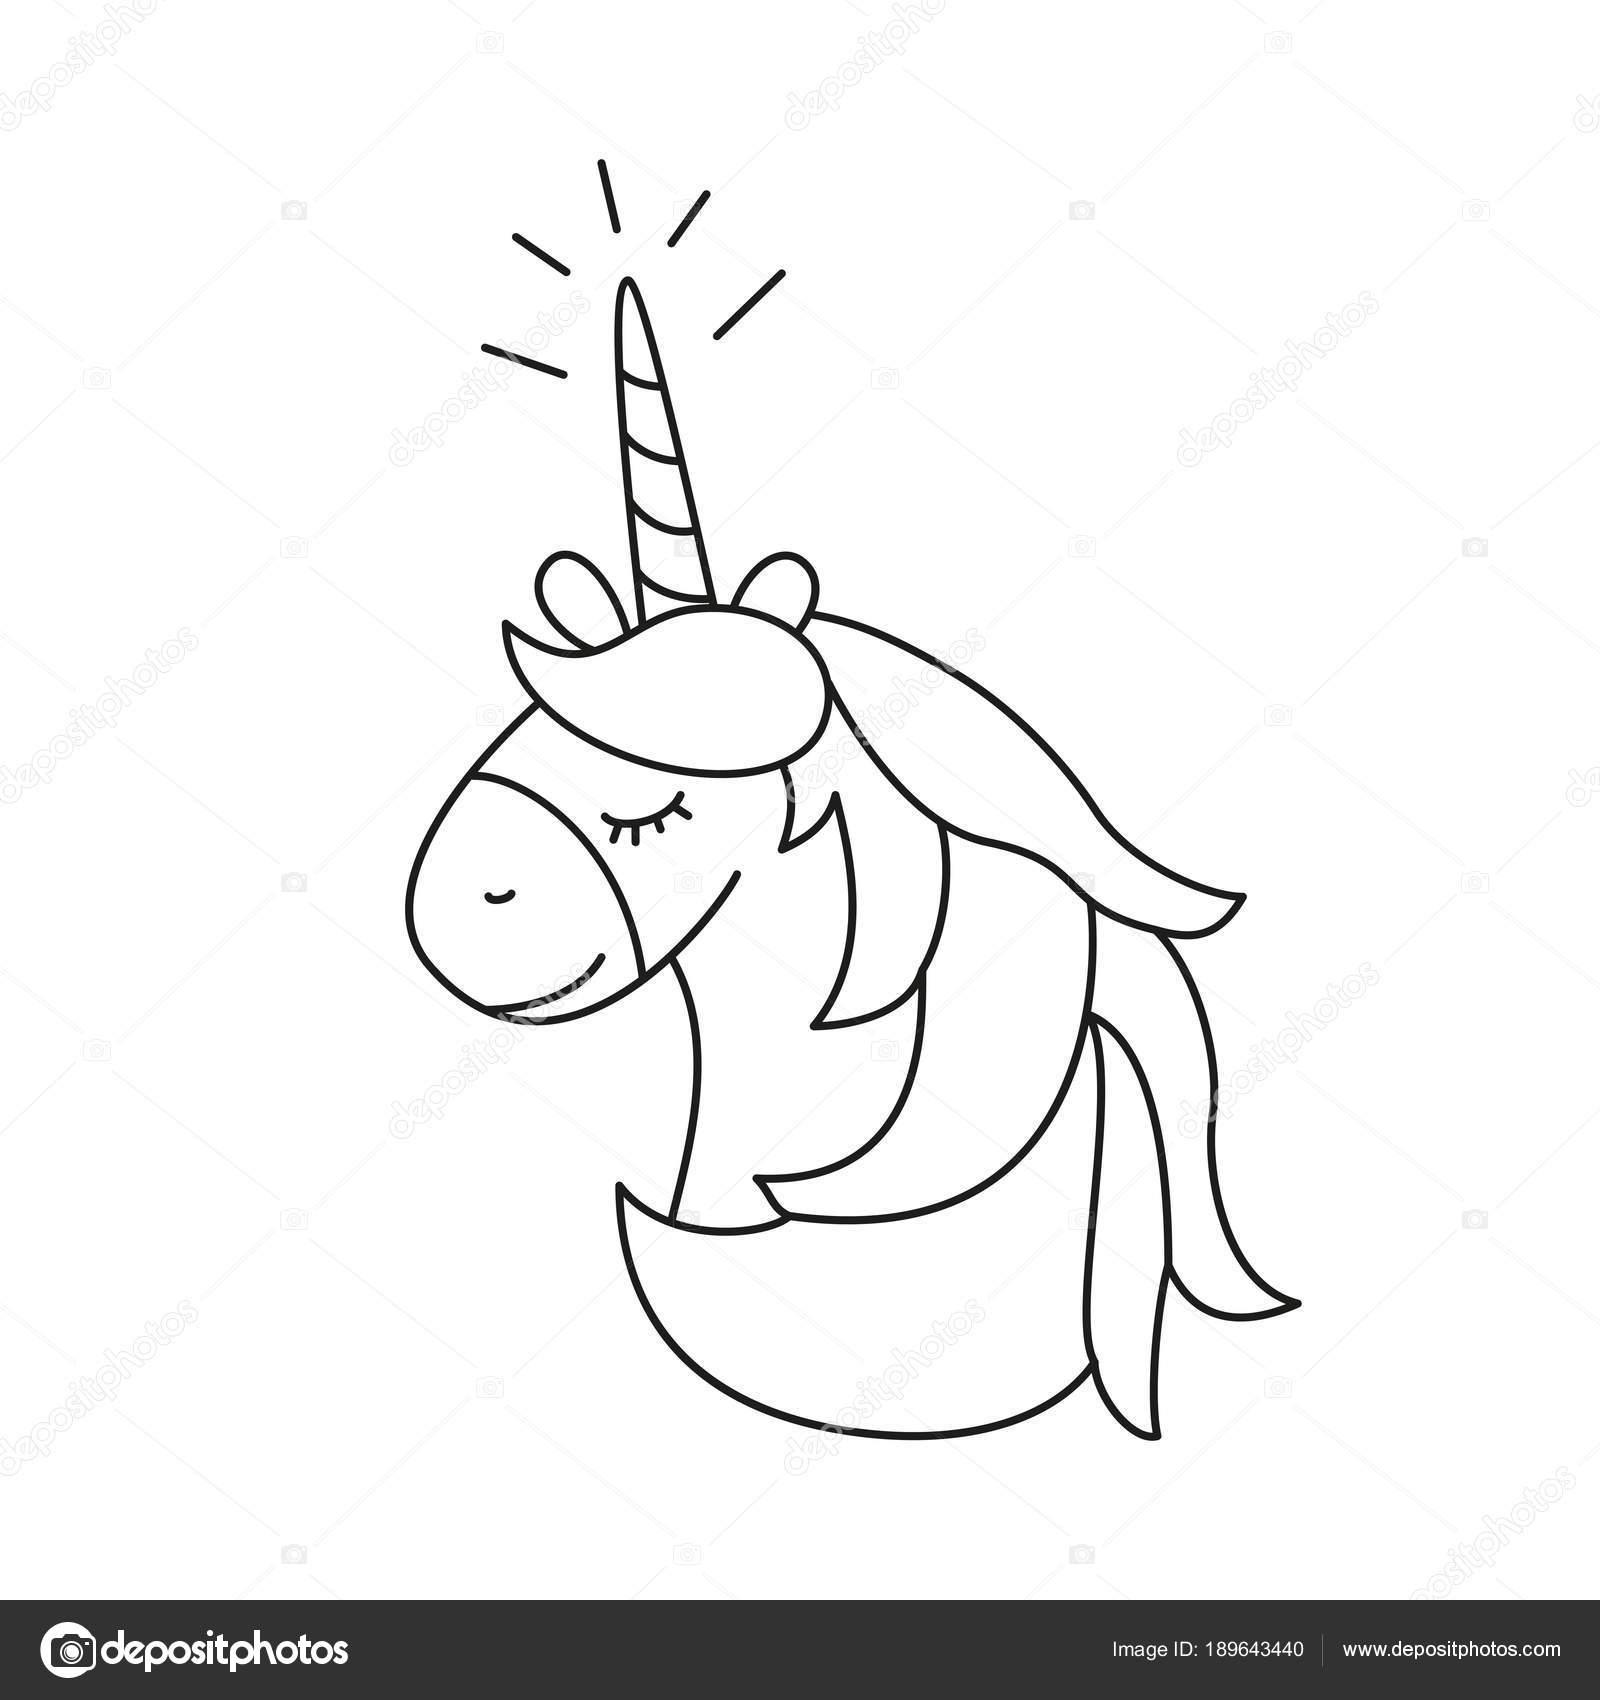 Fotos Silueta De Unicornio Para Colorear Ilustración Con